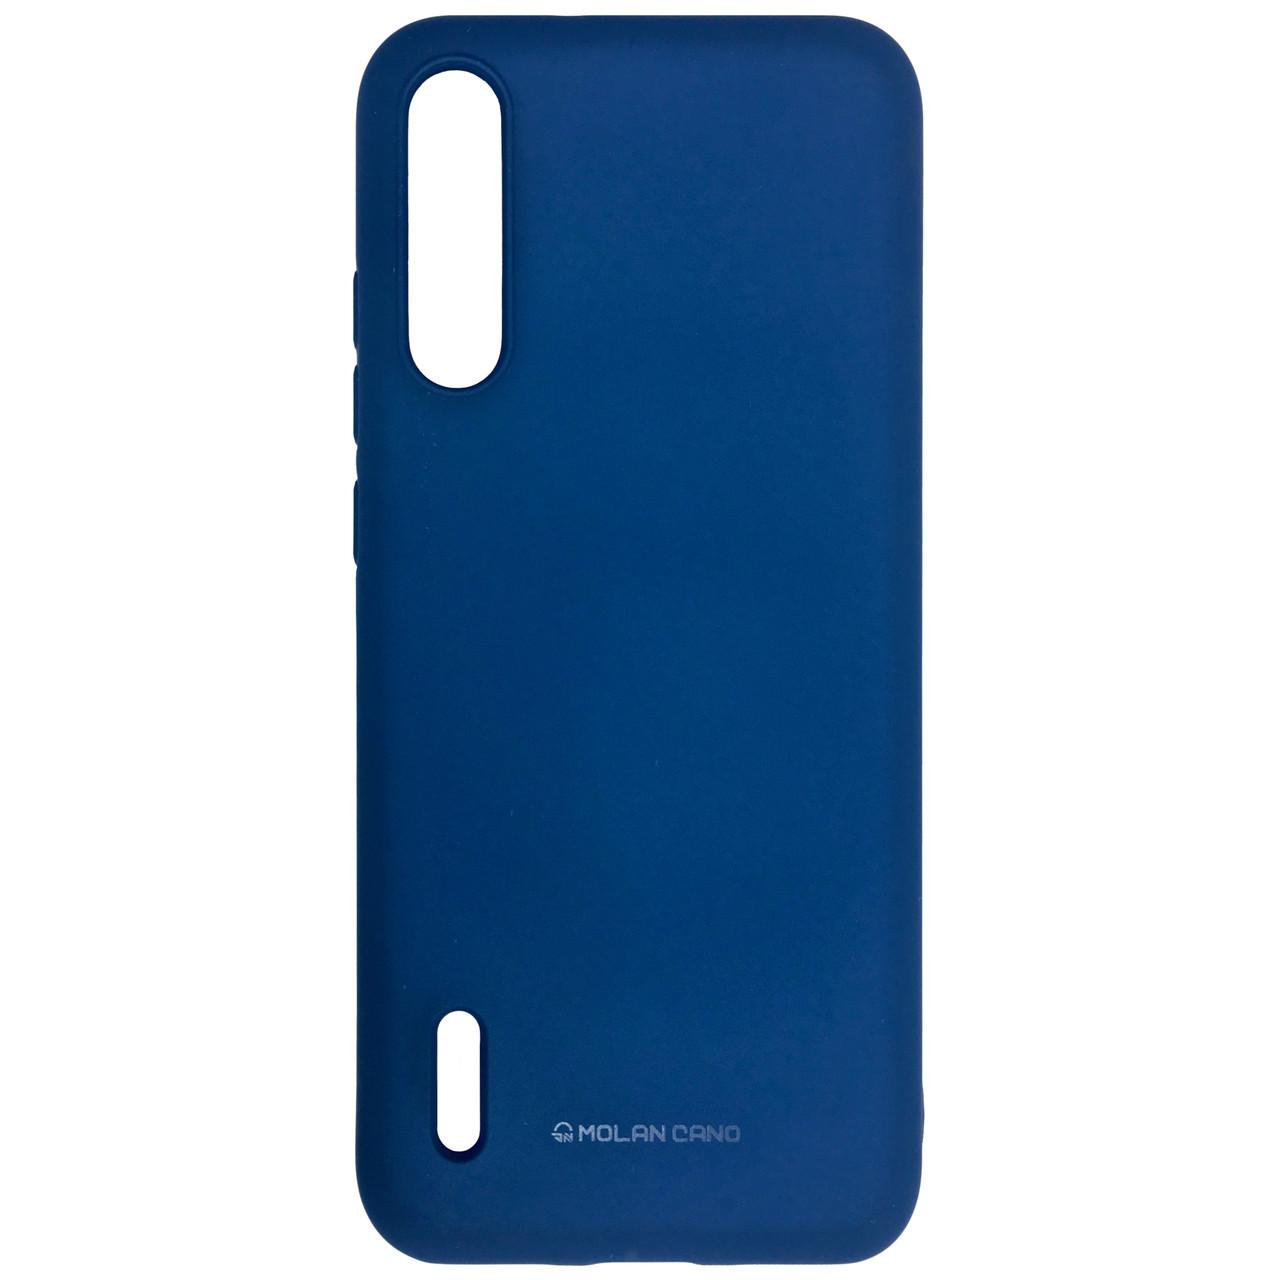 Чехол Silicone Hana Molan Cano Xiaomi Mi CC9 (blue)